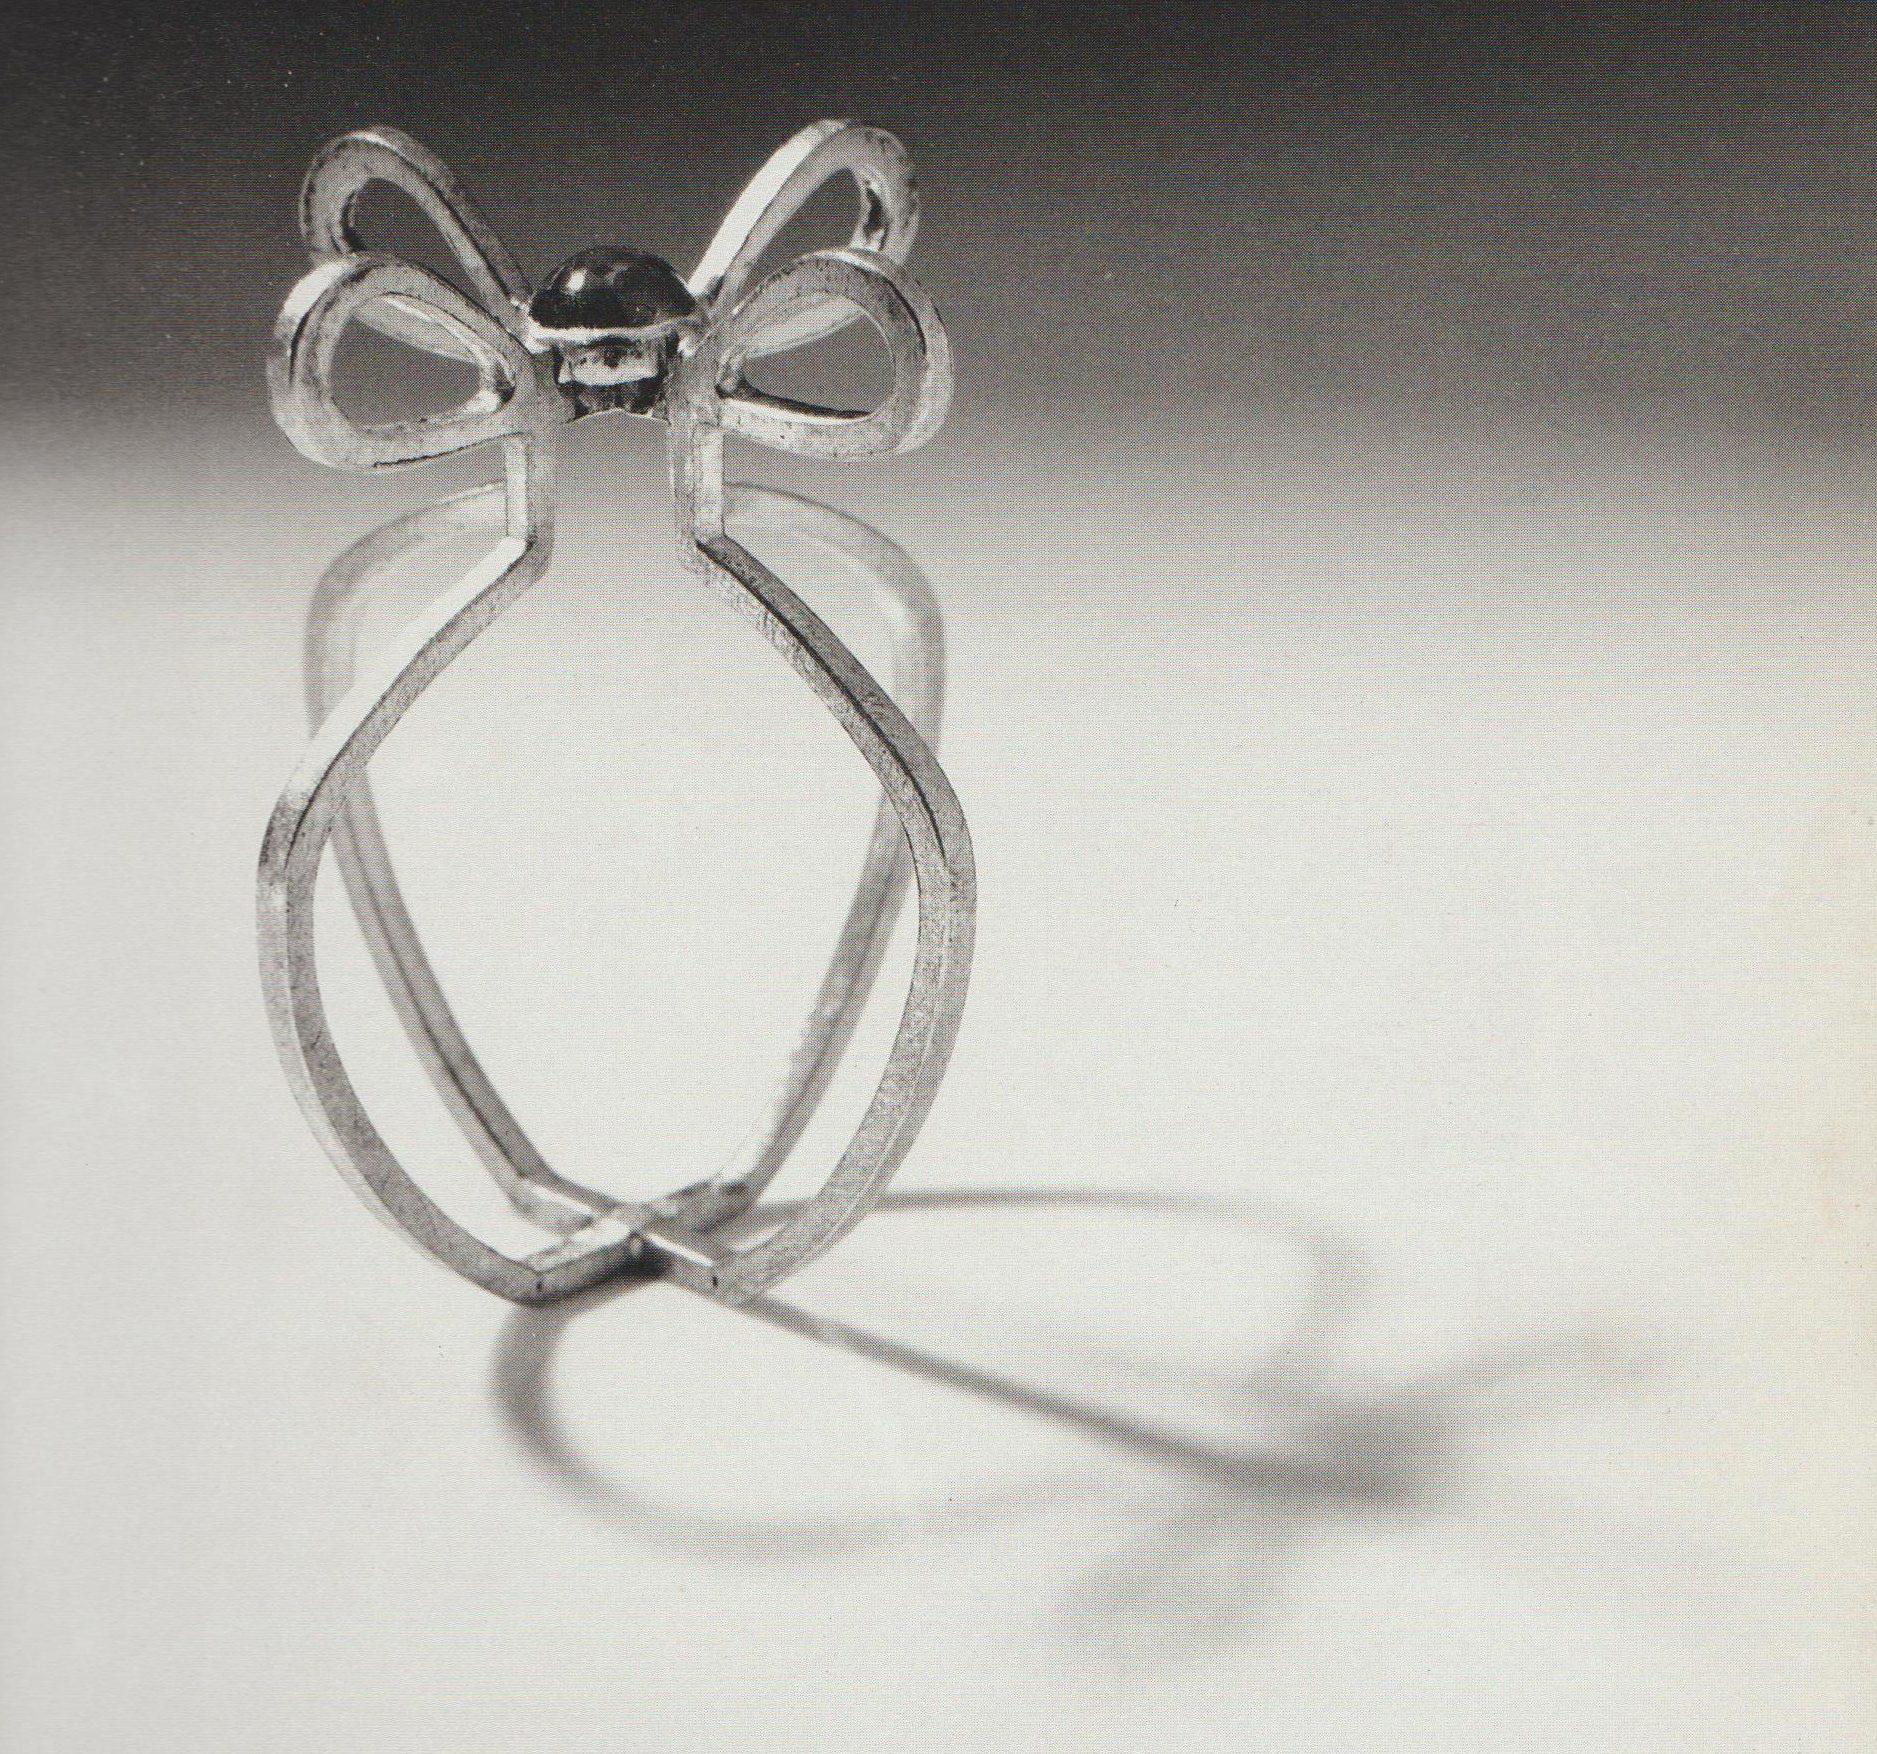 Francesca di Ciaula, Little Flower's Vase, ring, 1988. Collectie Museum Arnhem. Foto met dank aan Francesca di Ciaula©